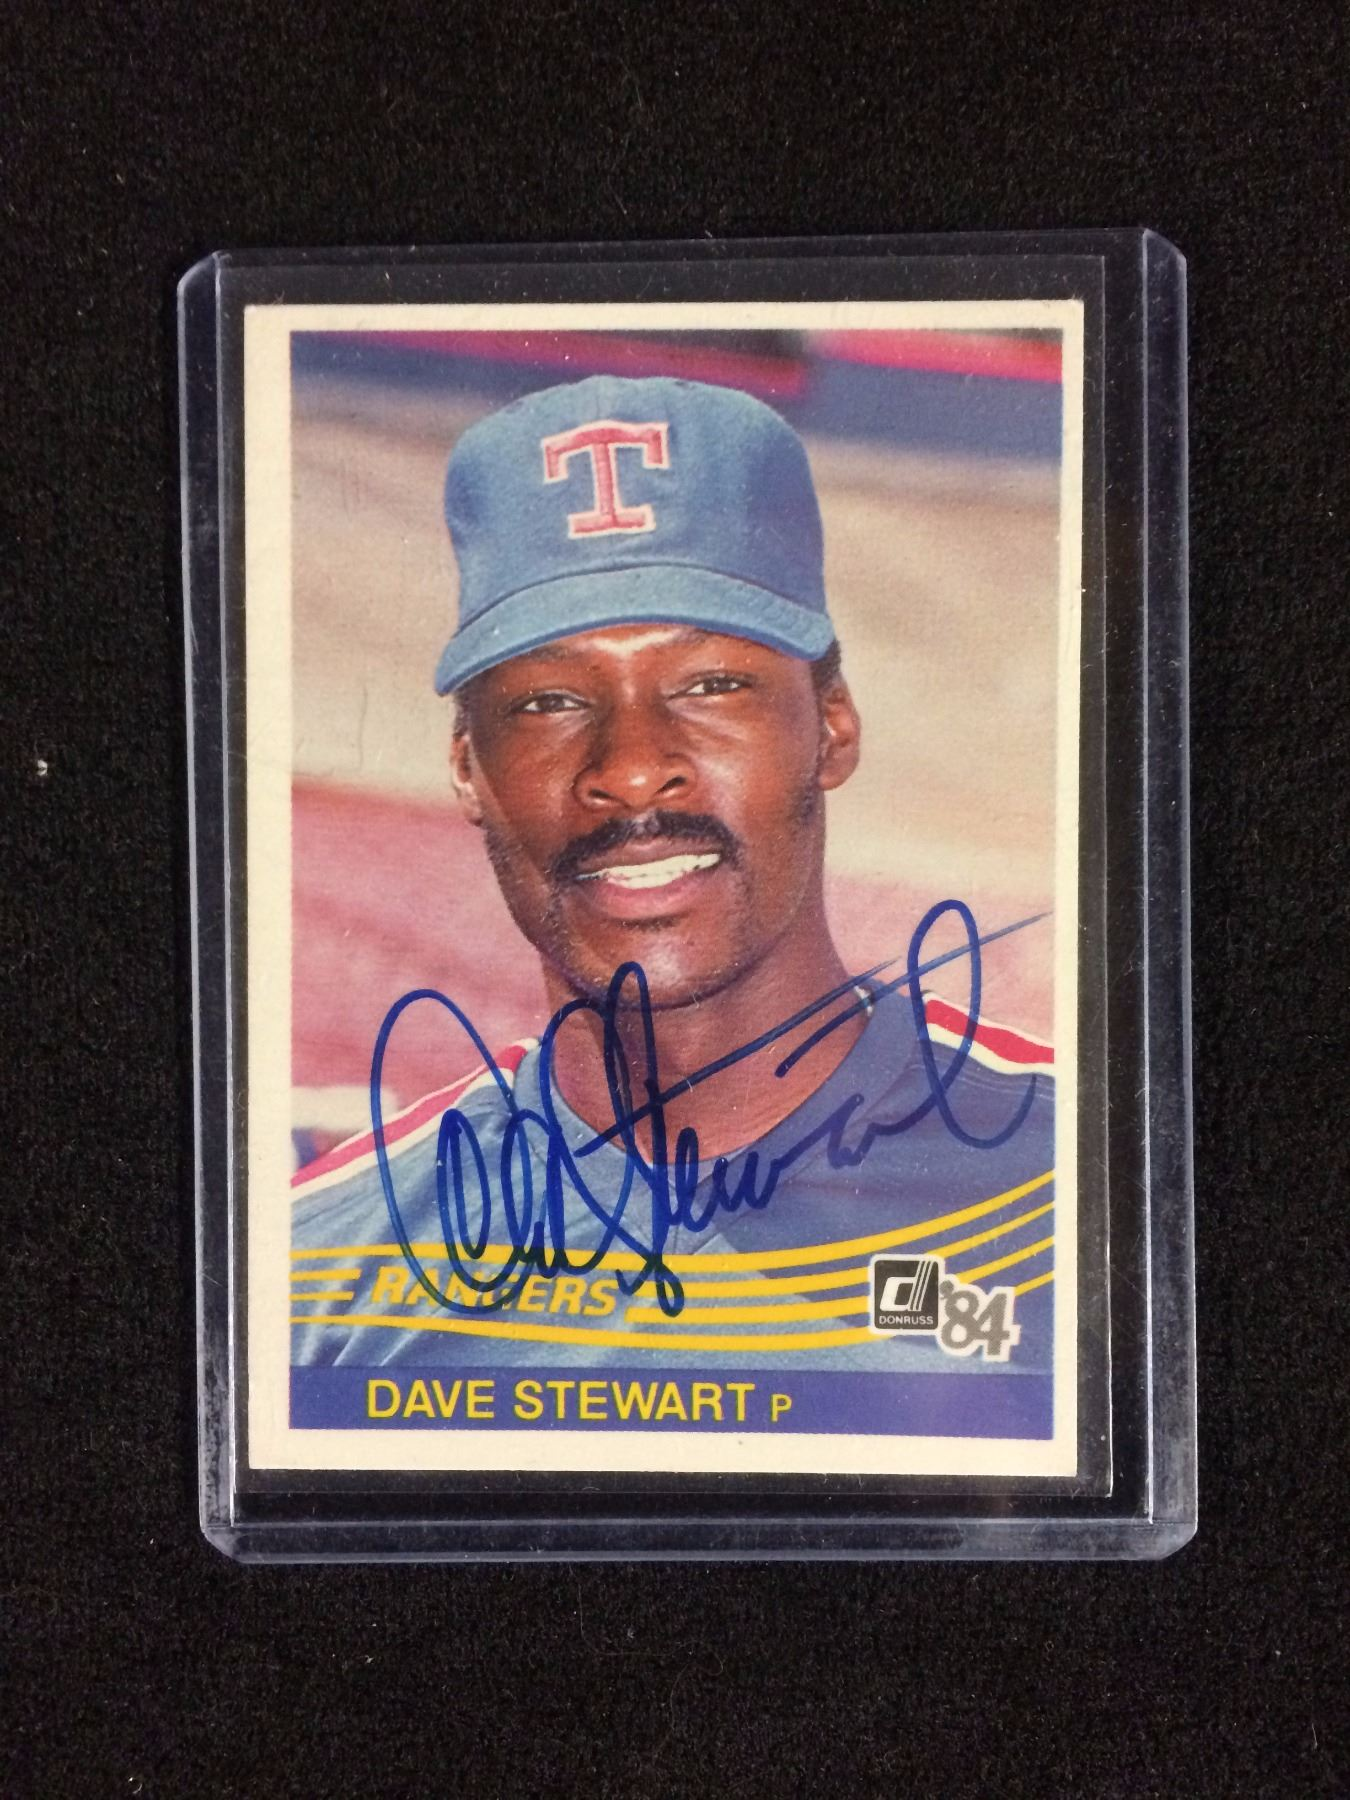 Autographed Dave Stewart Baseball Card